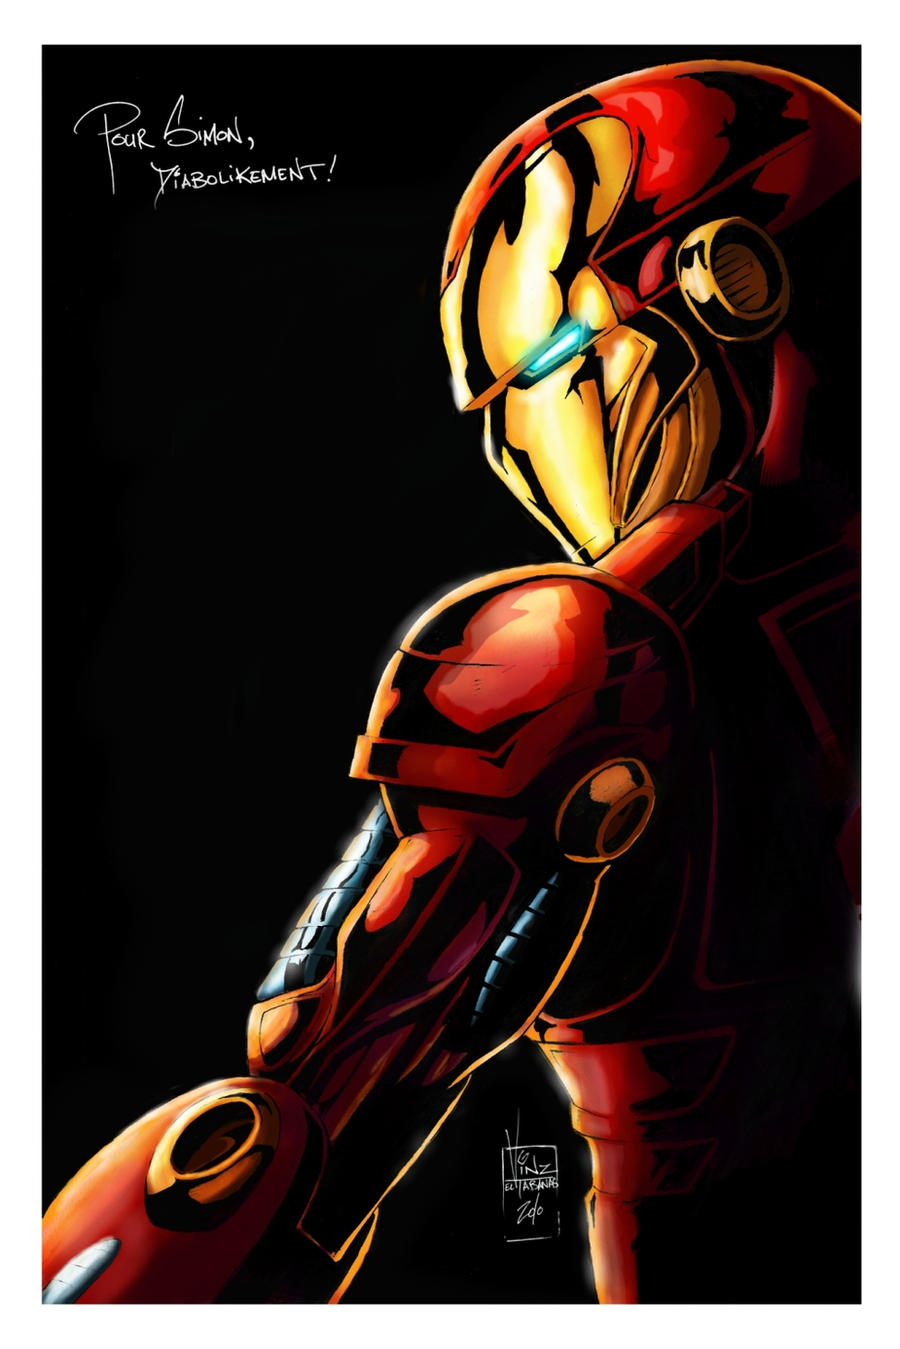 iron man profil by logicfun